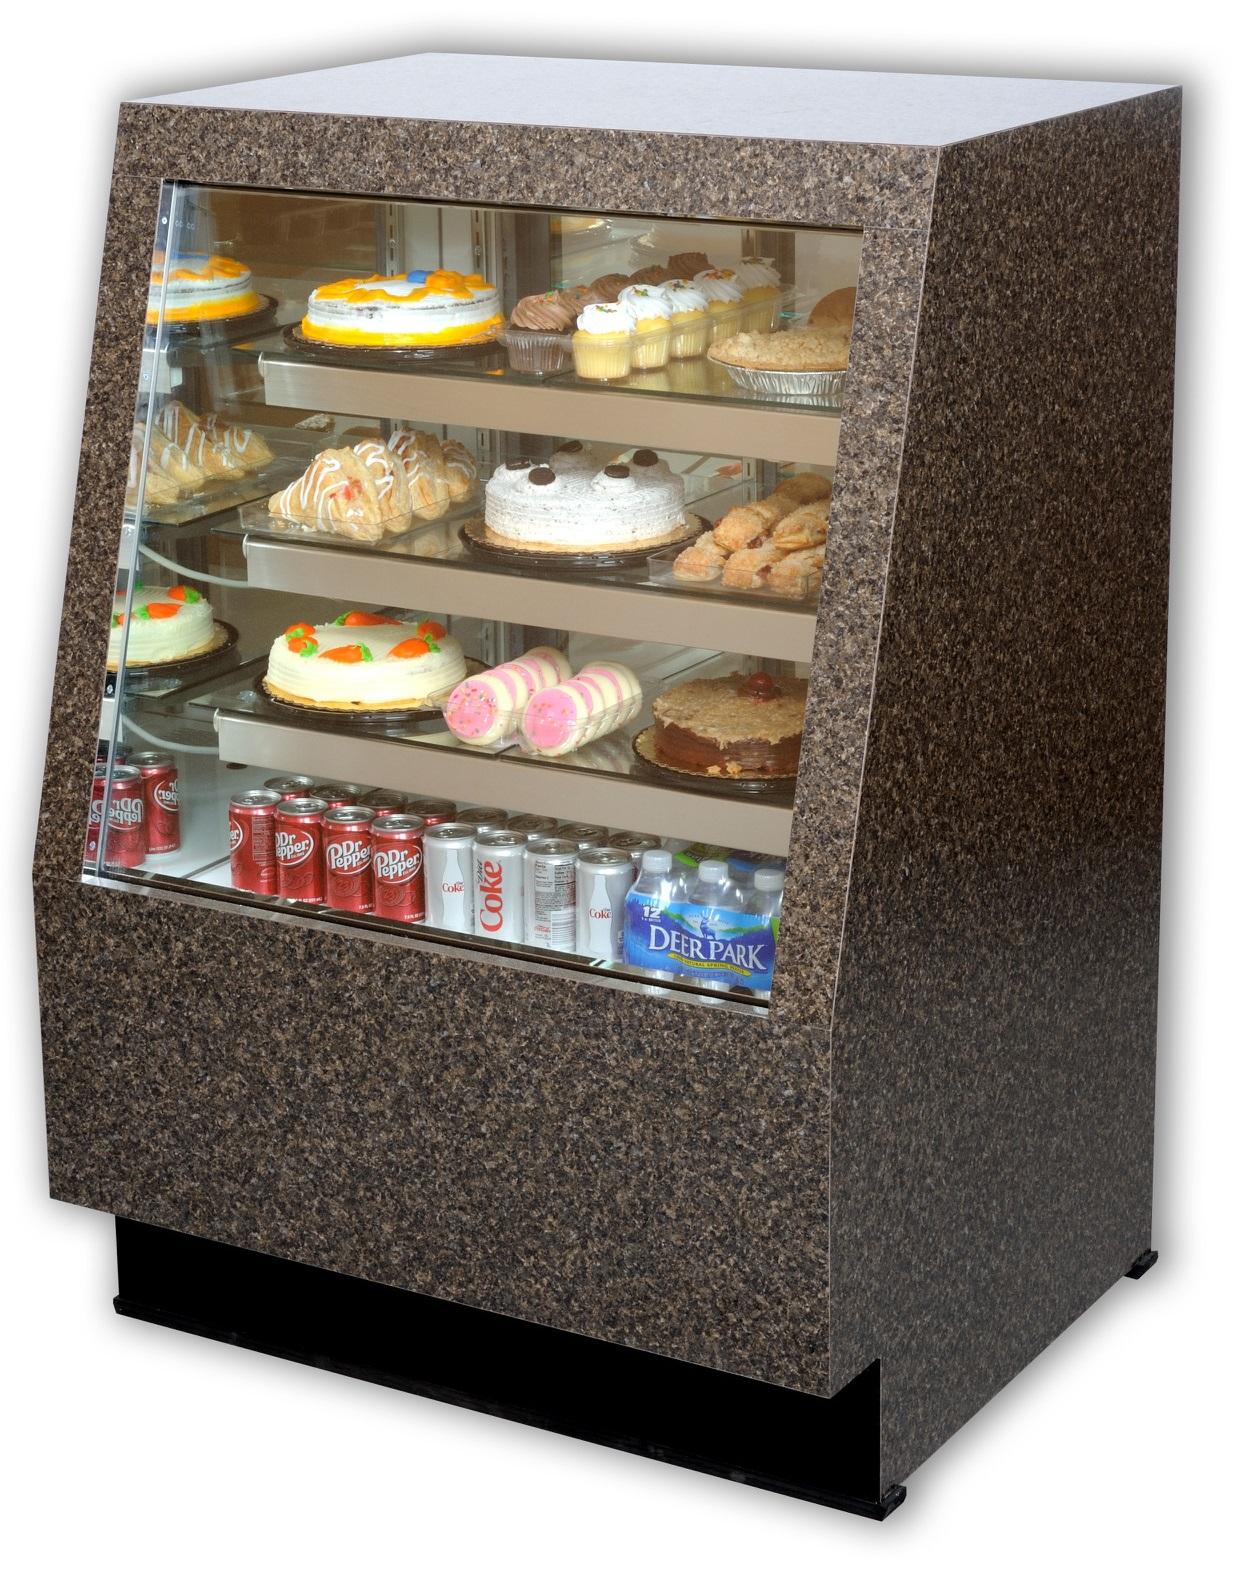 bakery-display-case-straight.jpg